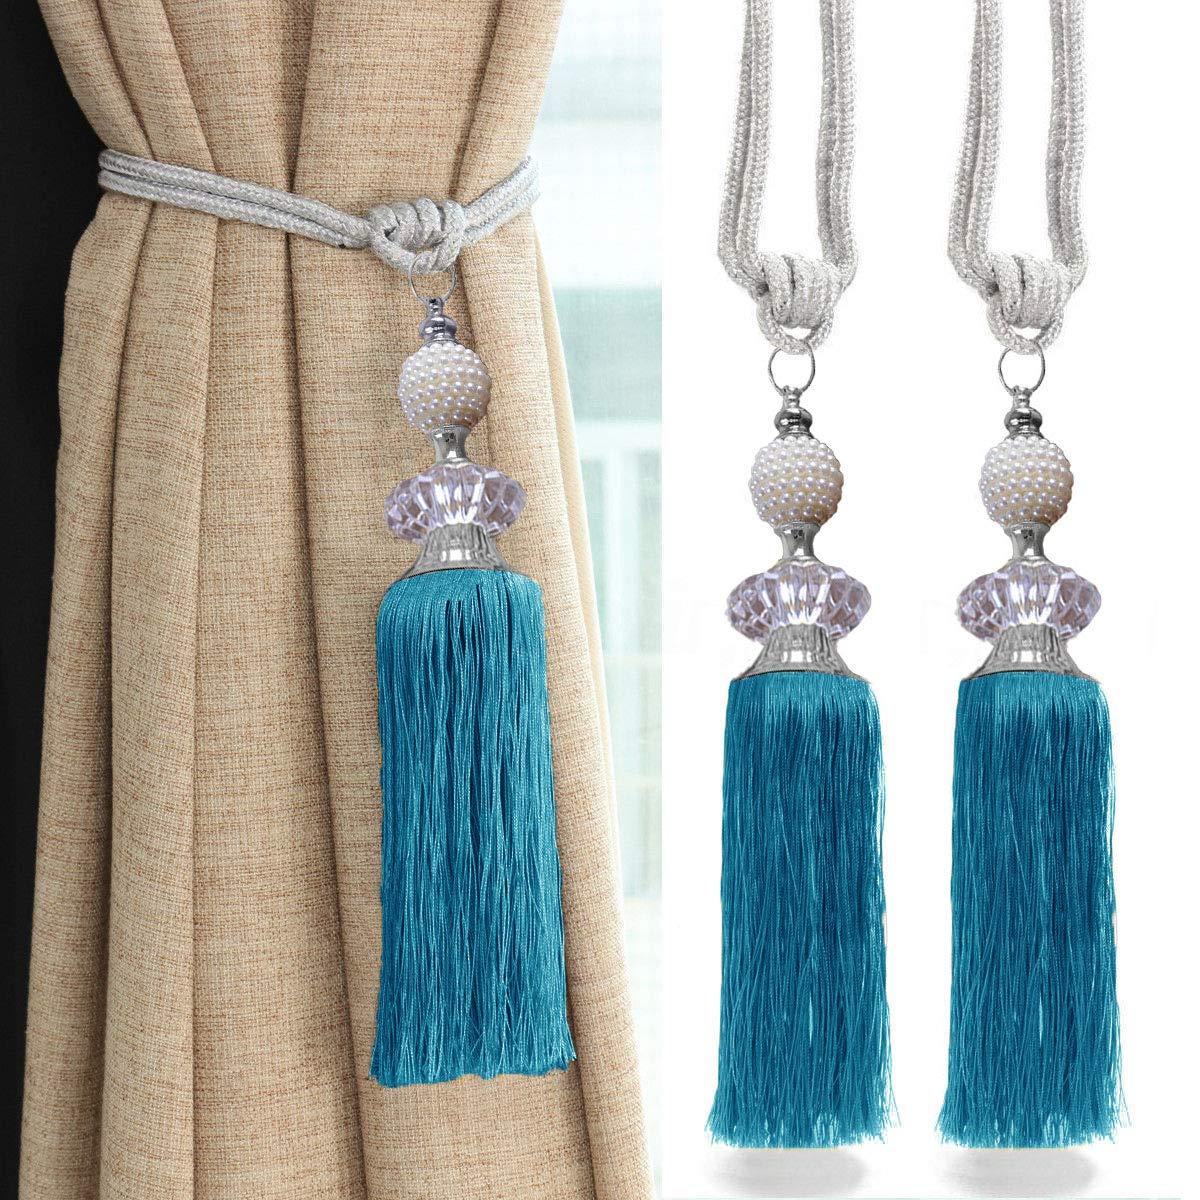 Army Green goowrom Crystal Beaded Curtain Tie Back 2pcs Tassel Tie Backs for Curtain Beautiful Curtain Holdback Rope